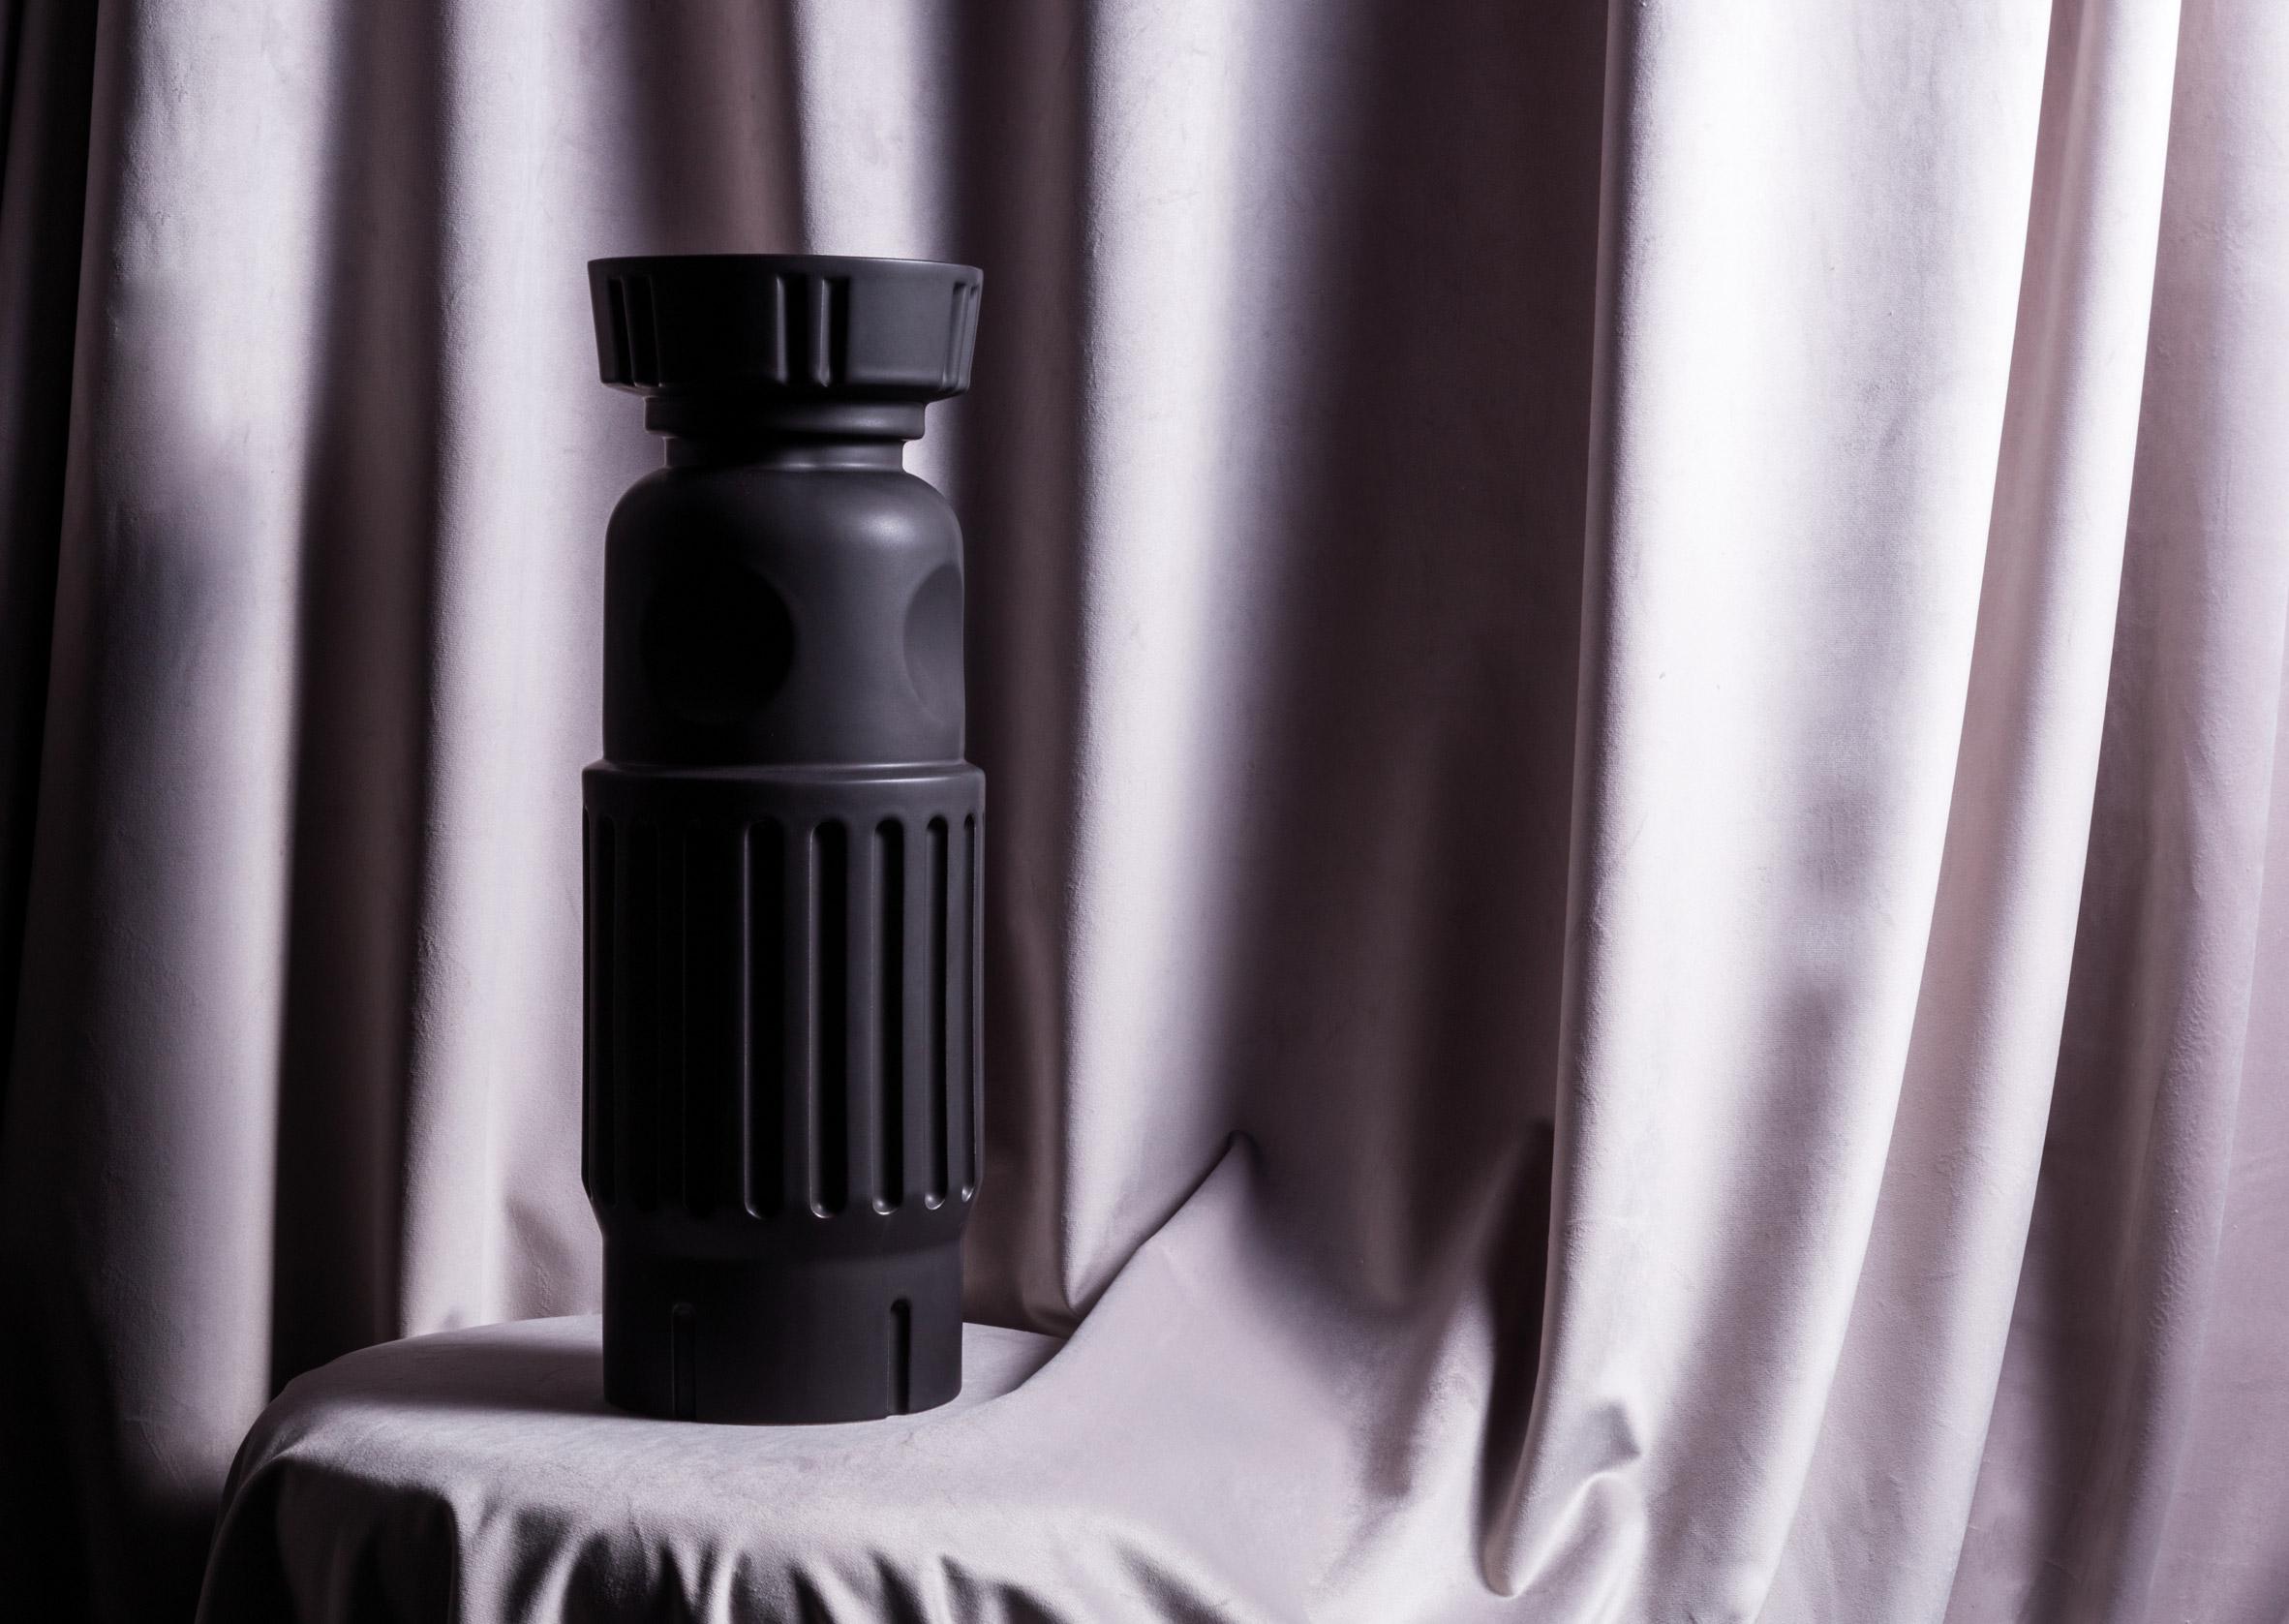 Visser & Meijwaard create black vessels inspired by traditional Dutch cabinets